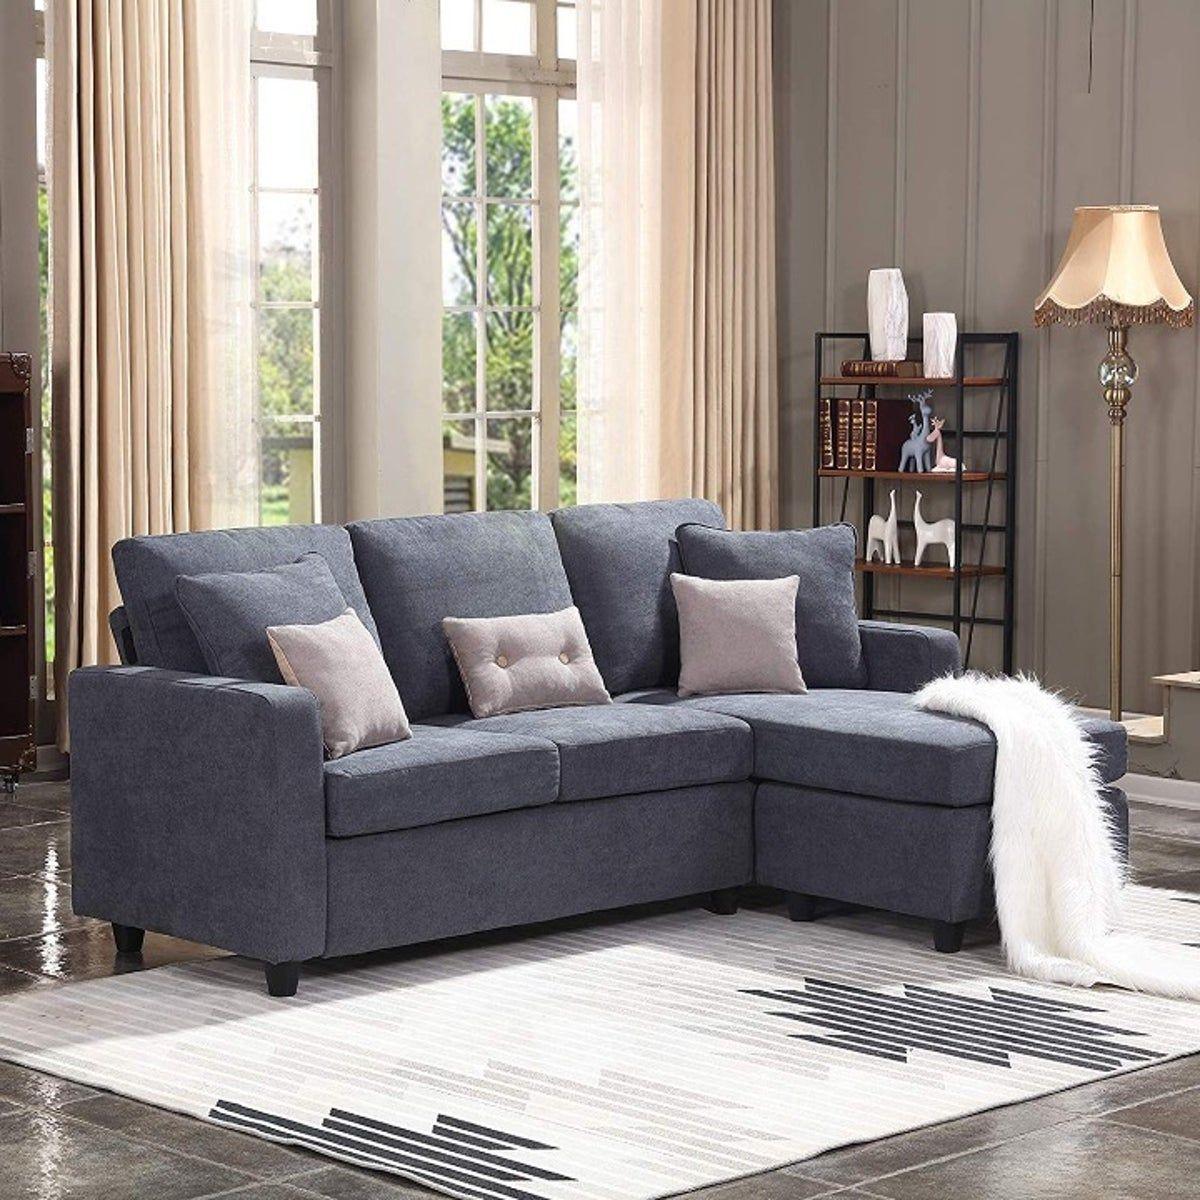 Honbay Convertible Sectional Sofa Couch 2020 安いソファ モダンリビングルーム リビングルームのデザイン